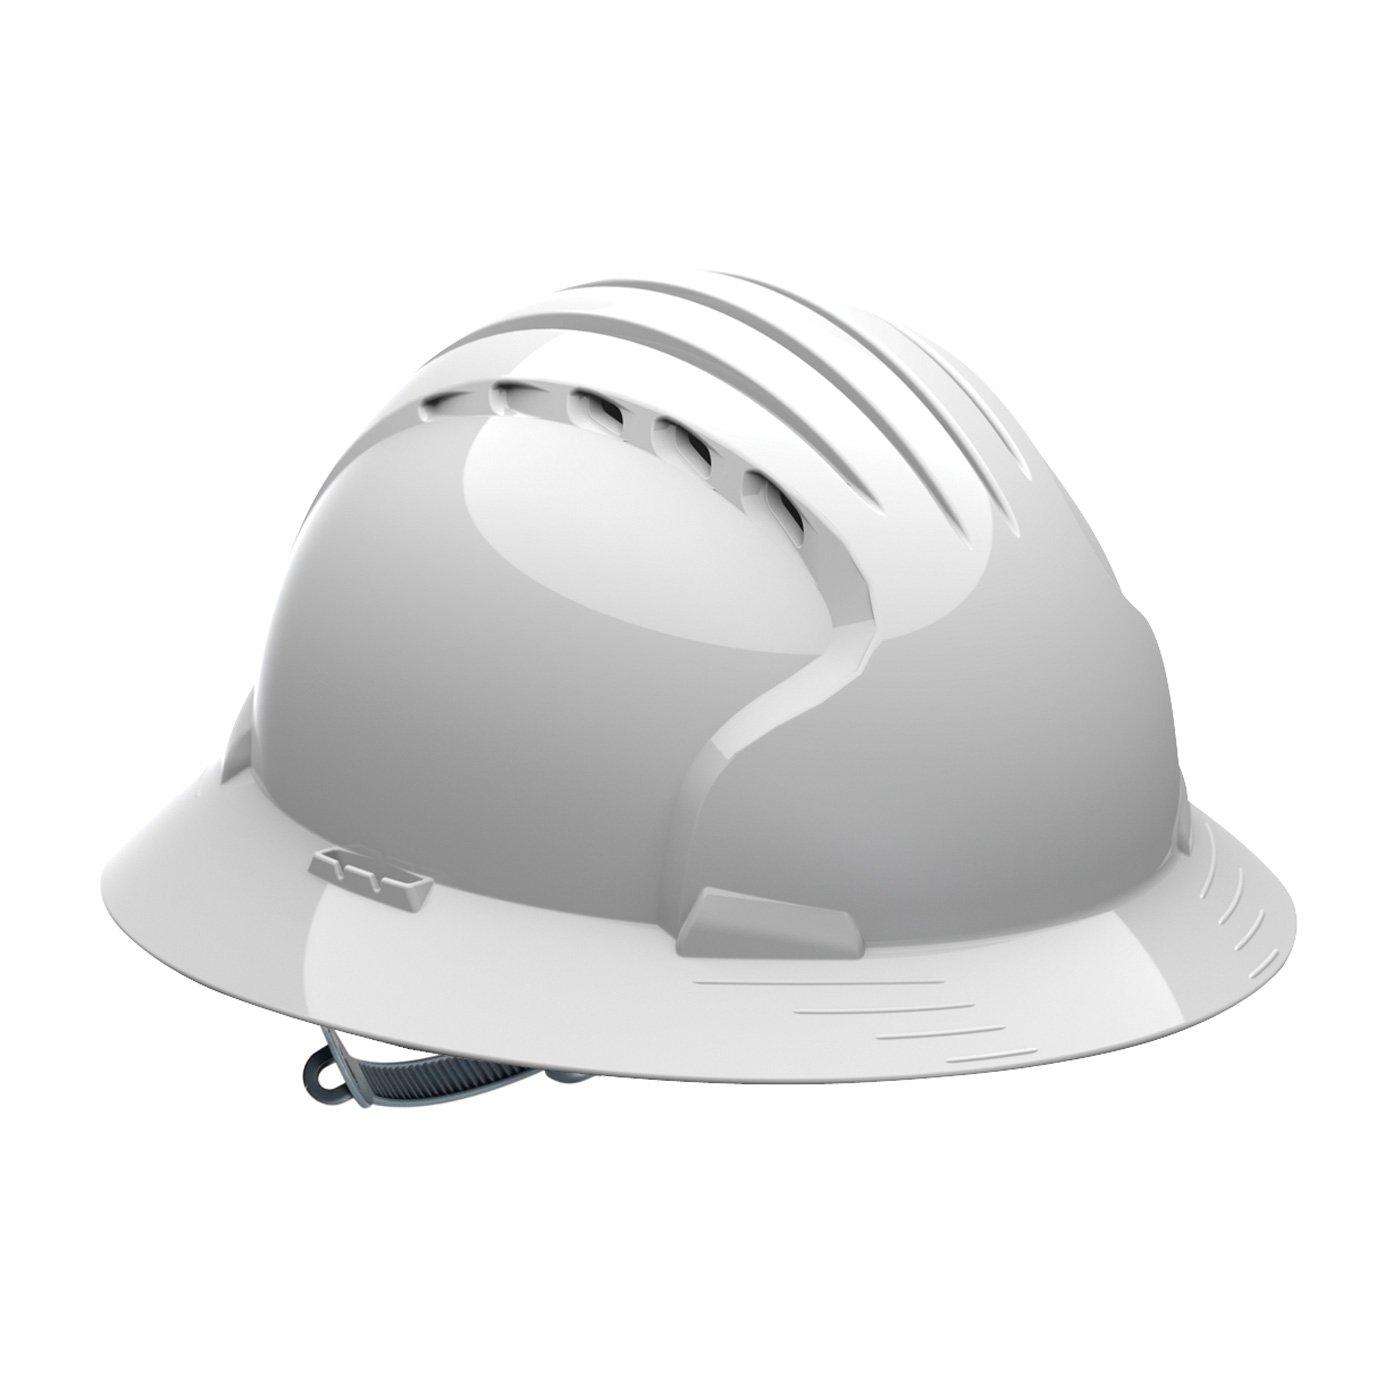 Evolution Deluxe 6141 280-EV6141V-20 Vented, Full Brim Hard Hat with HDPE Shell, 6-Point Polyester Suspension and Slip Ratchet Adjustment